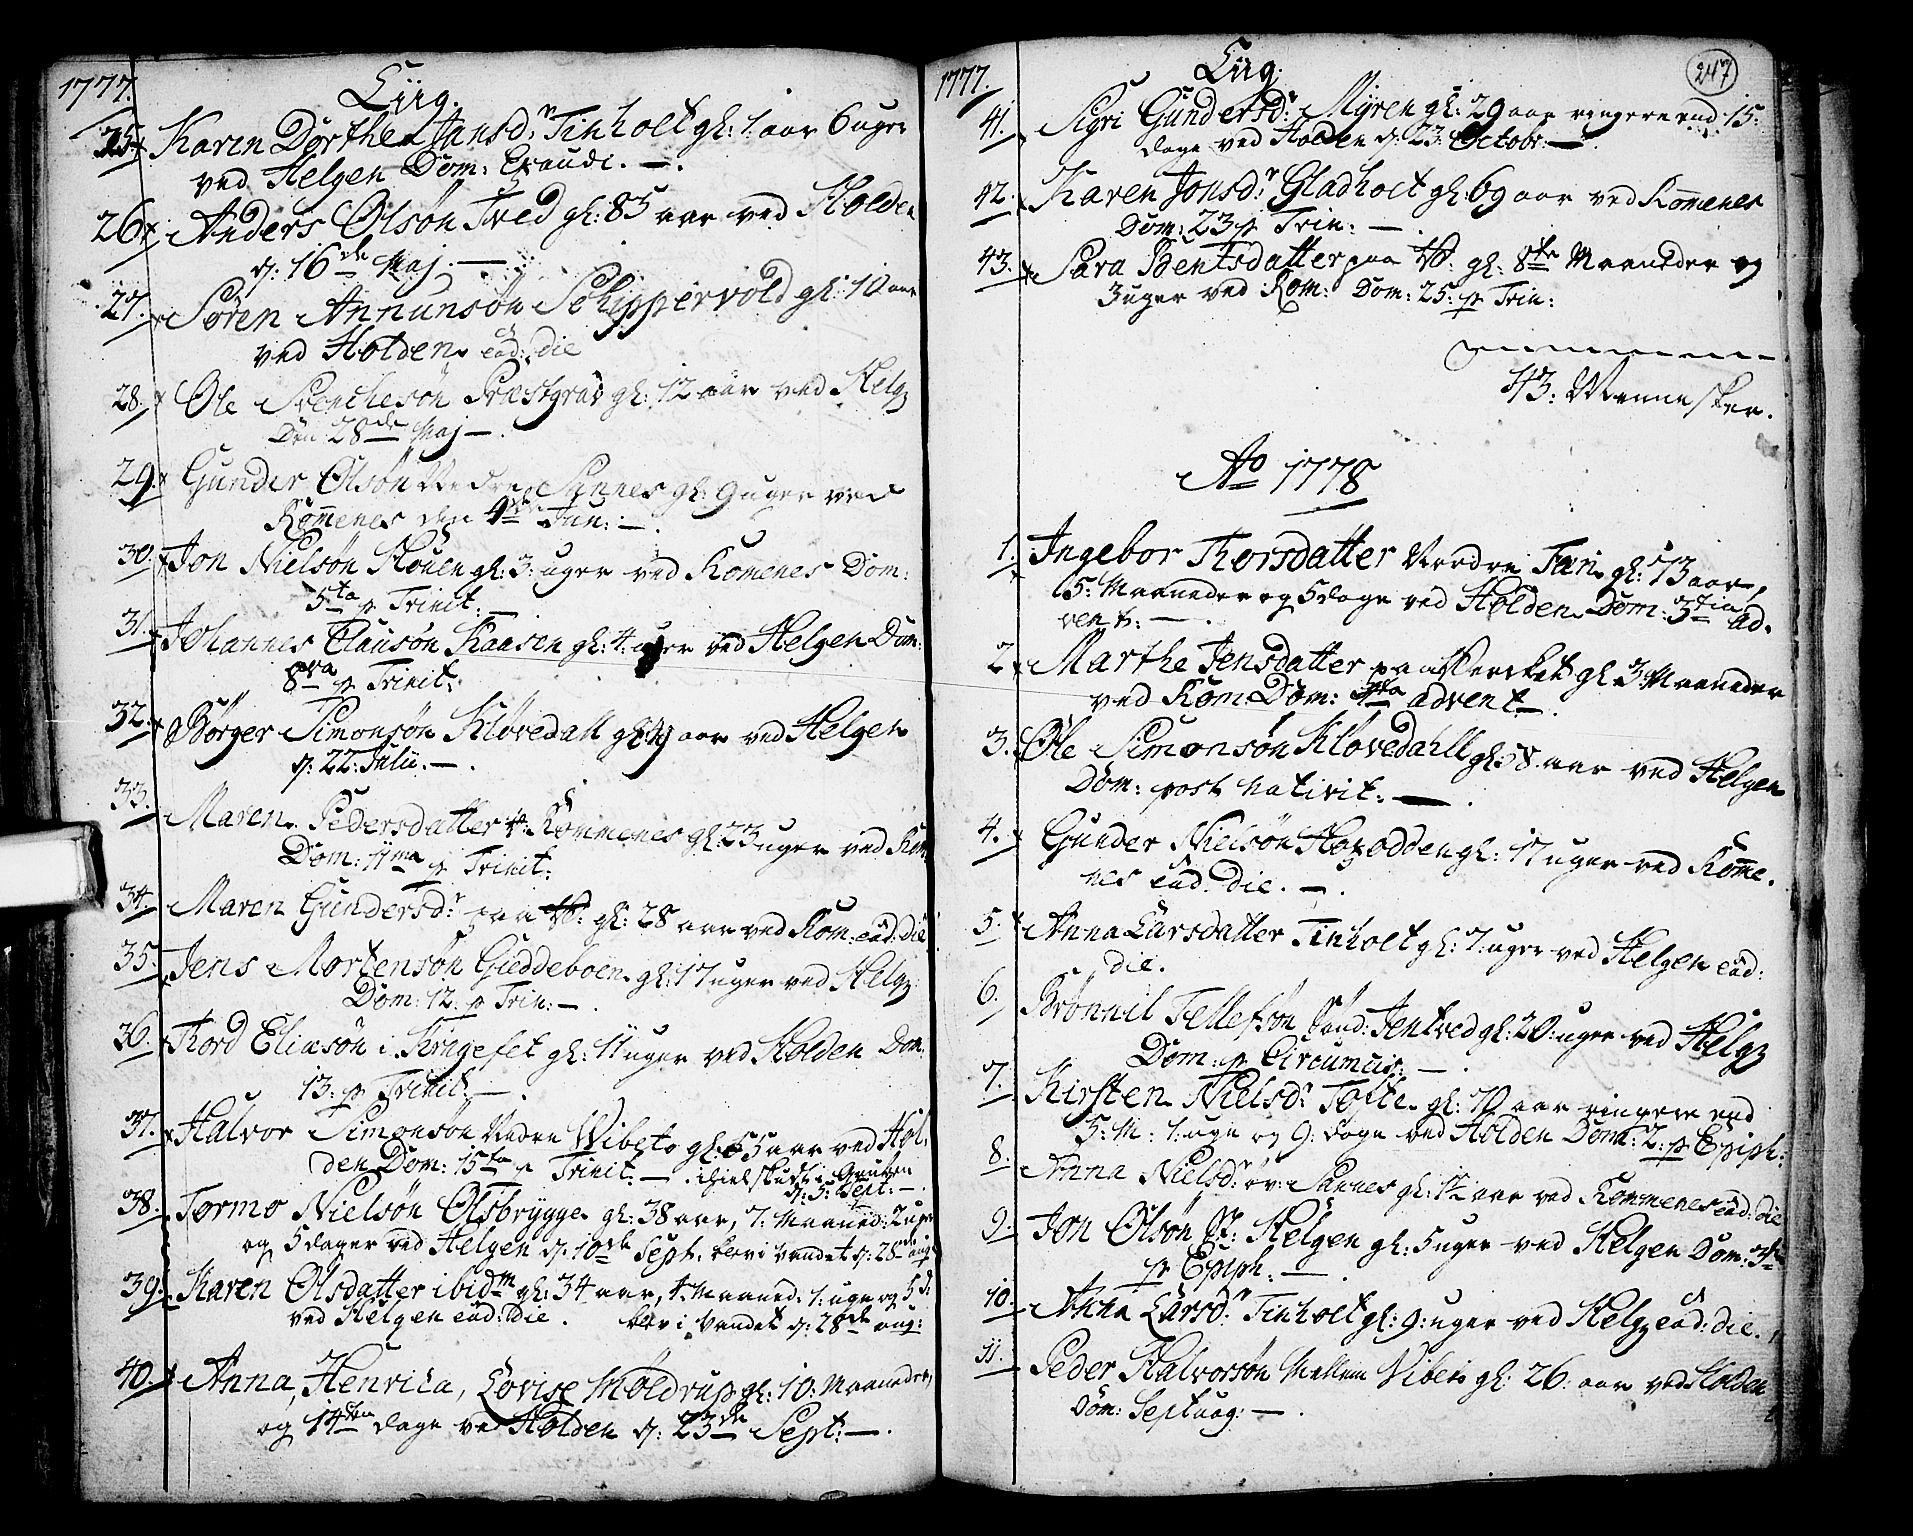 SAKO, Holla kirkebøker, F/Fa/L0001: Ministerialbok nr. 1, 1717-1779, s. 247